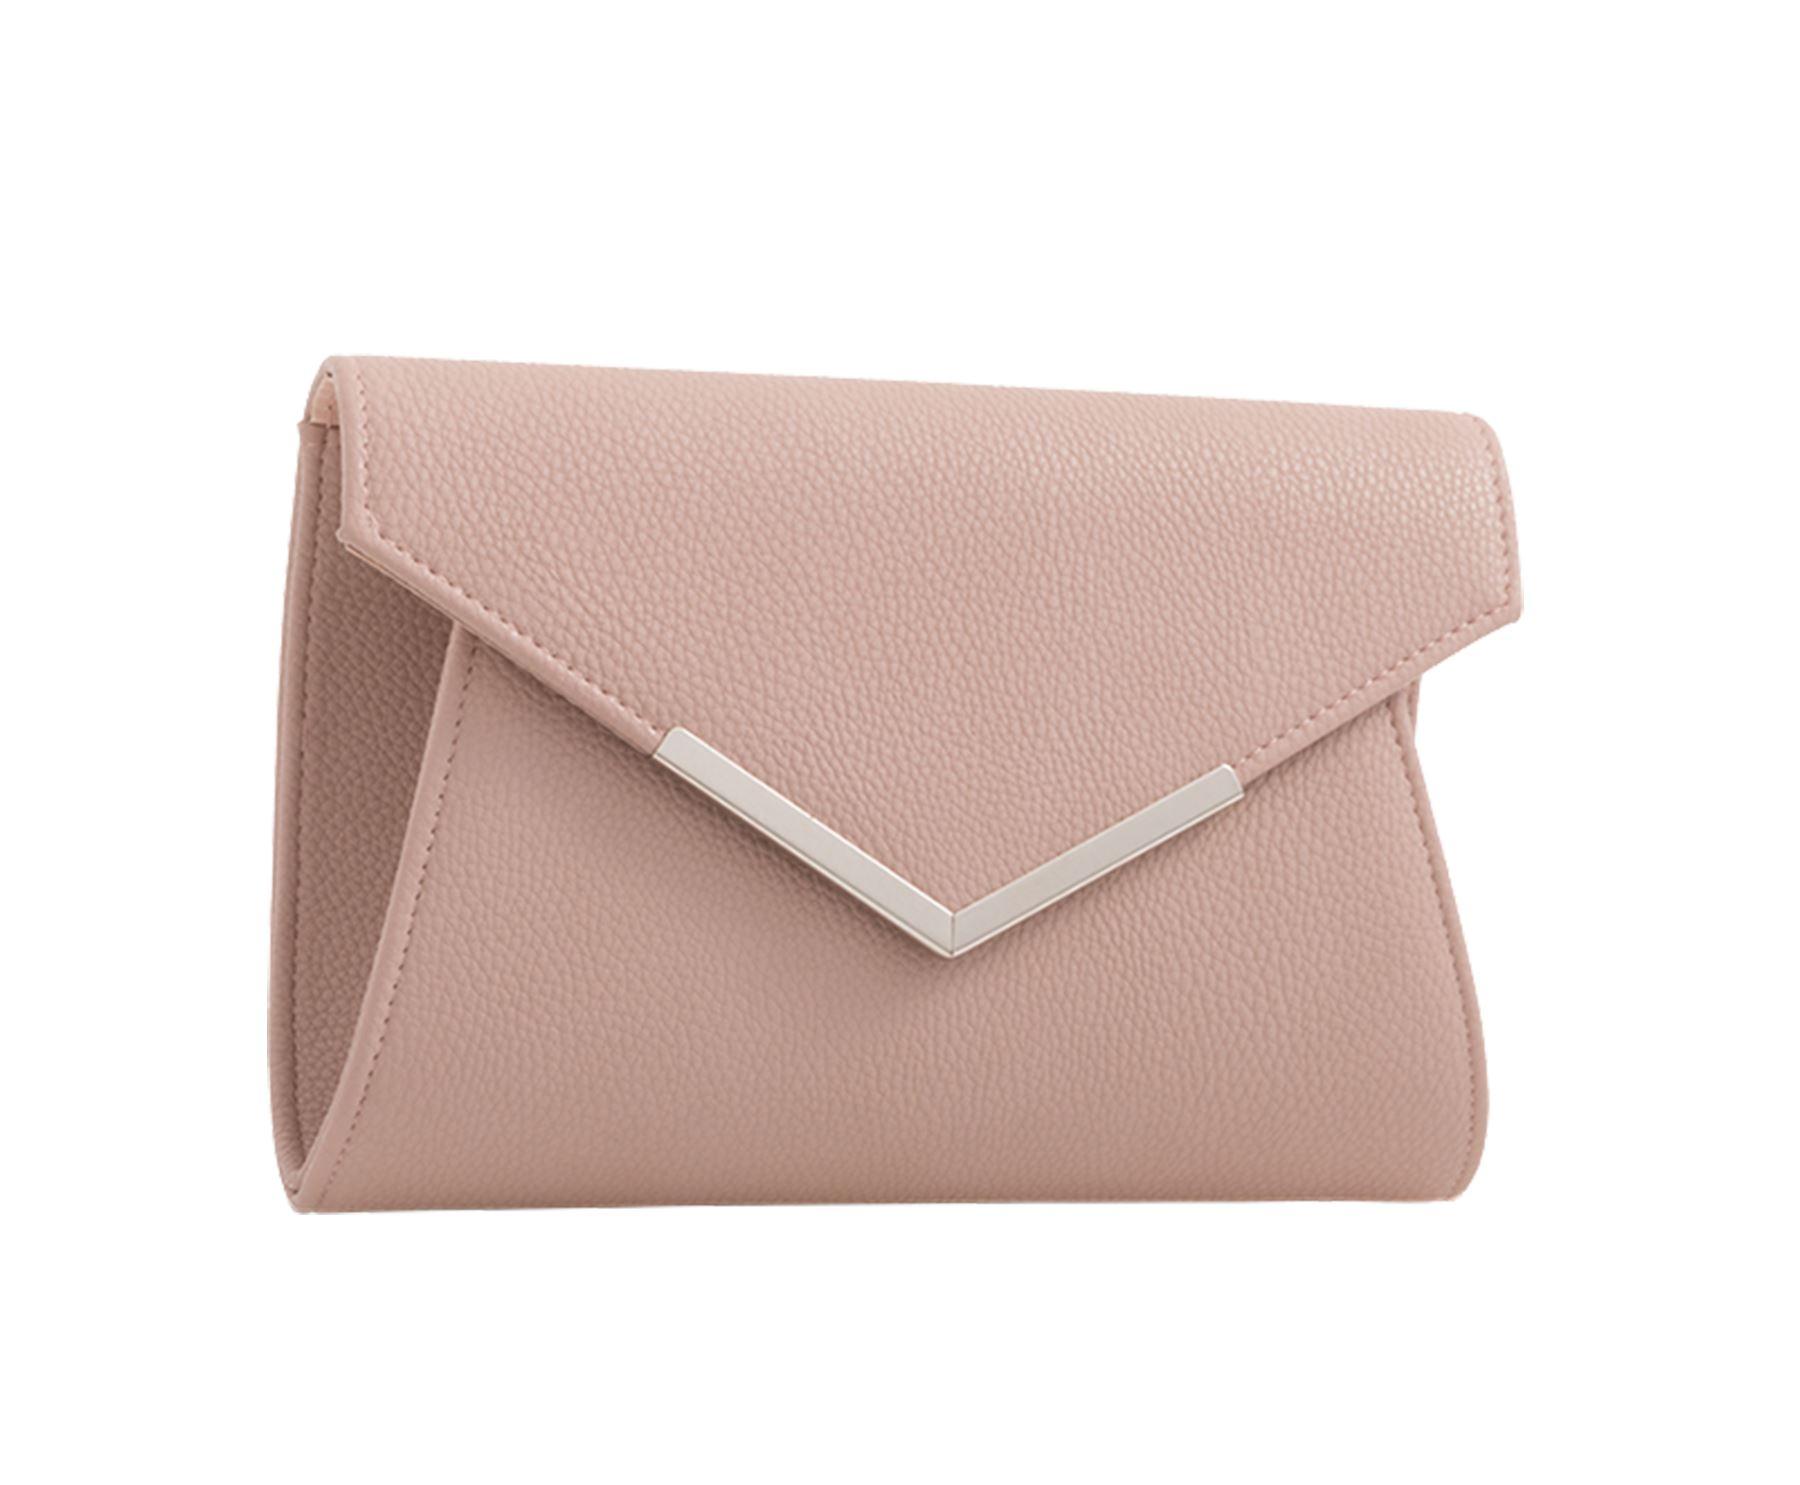 New Satin Glitter Flap Arrow Trim Ladies Evening Clutch Bag Purse